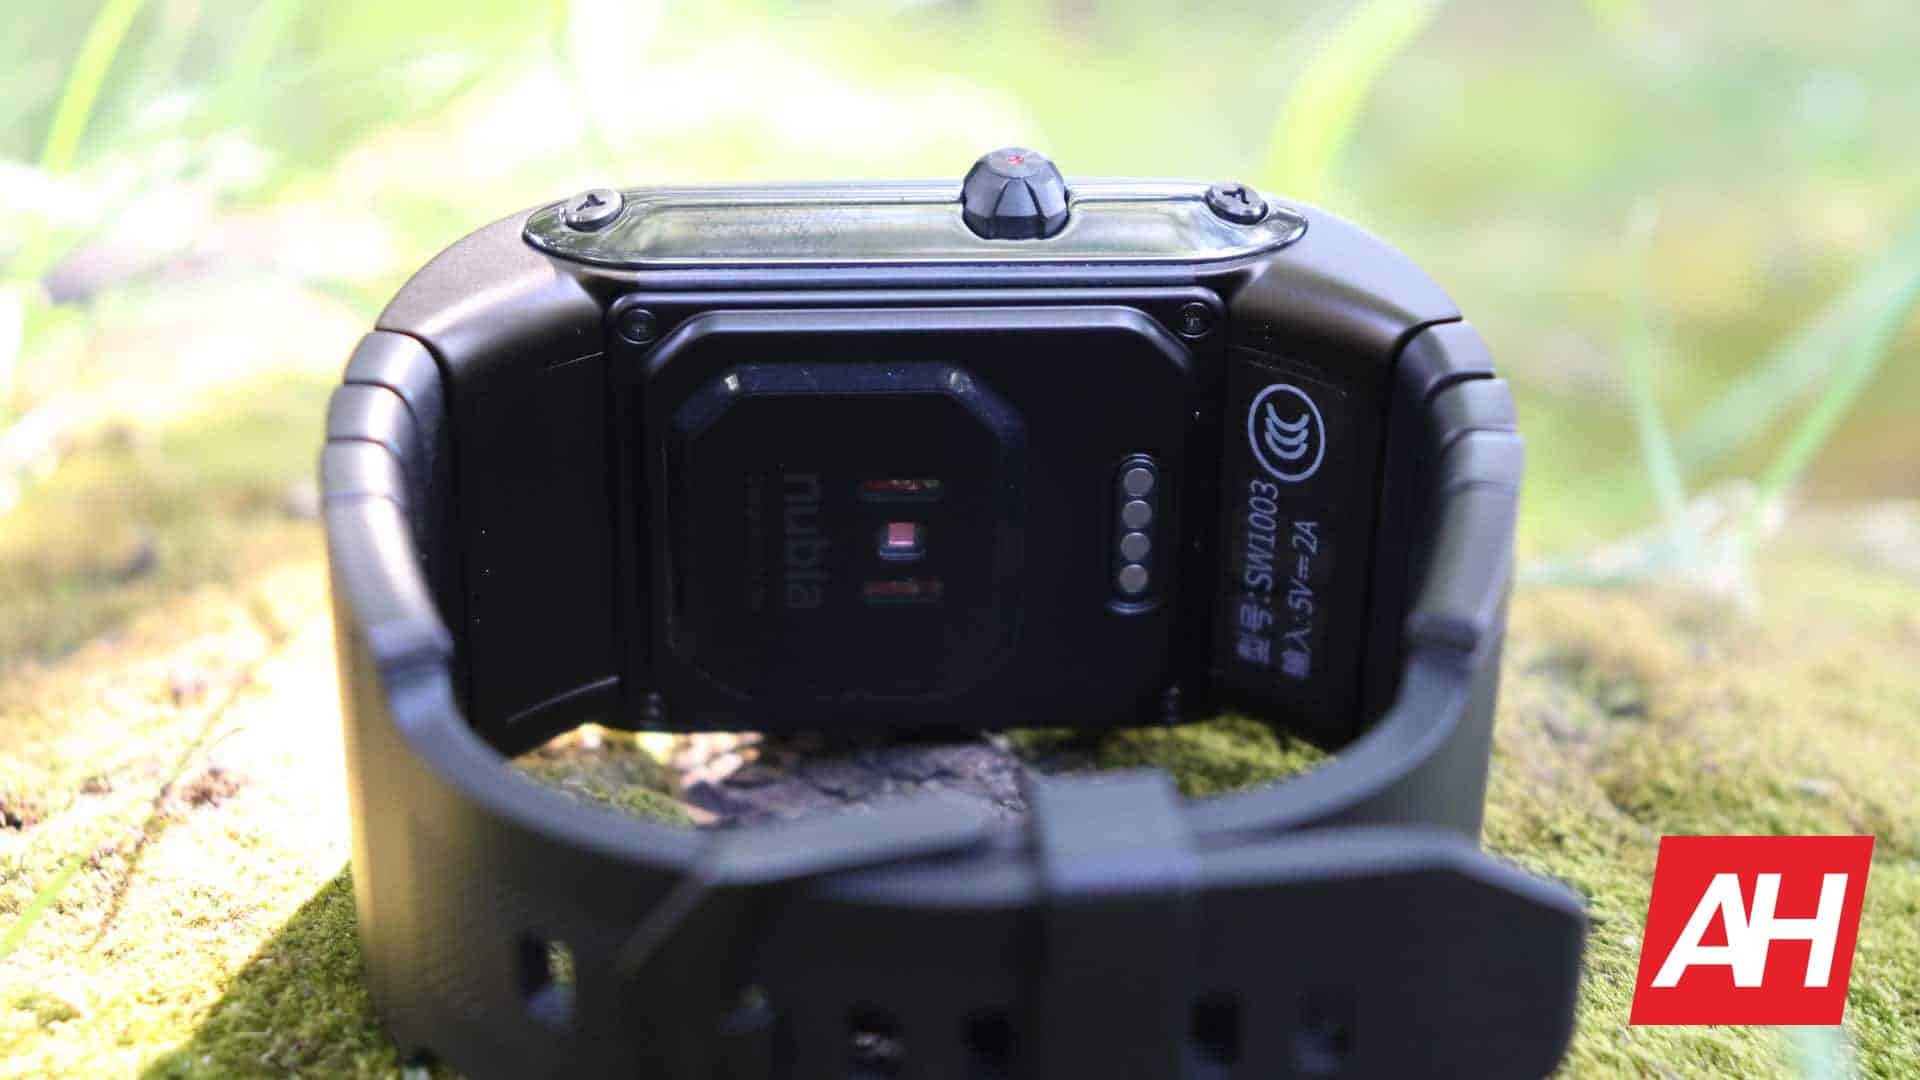 01 7 Nubia Watch Review Hardware DG AH 2020